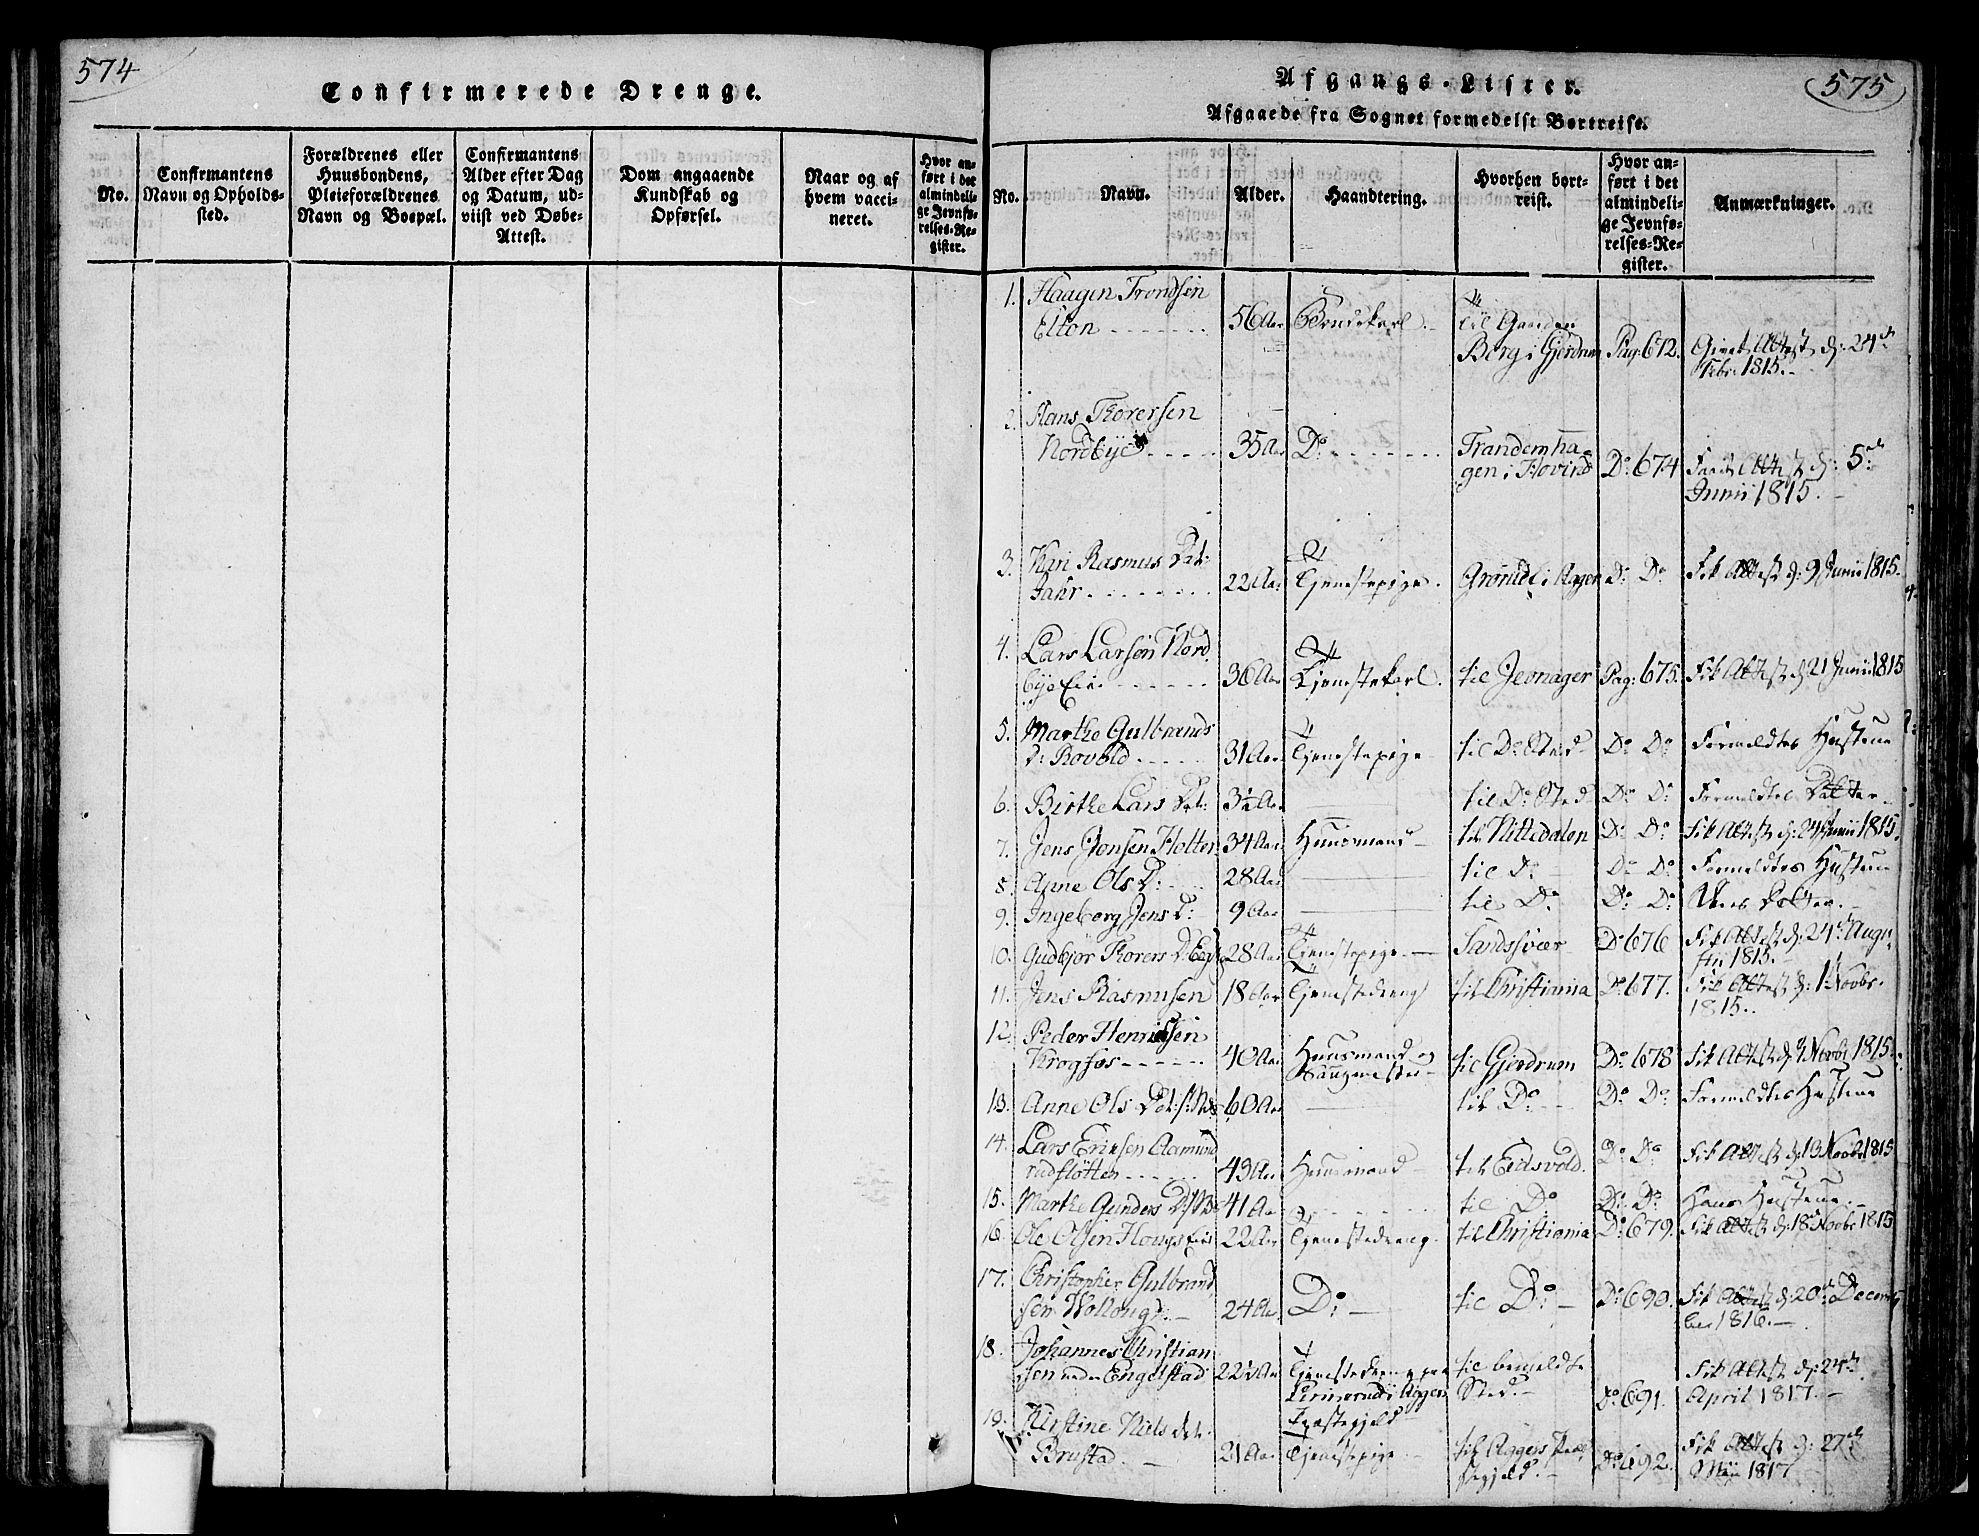 SAO, Nannestad prestekontor Kirkebøker, F/Fa/L0009: Ministerialbok nr. I 9, 1815-1840, s. 574-575